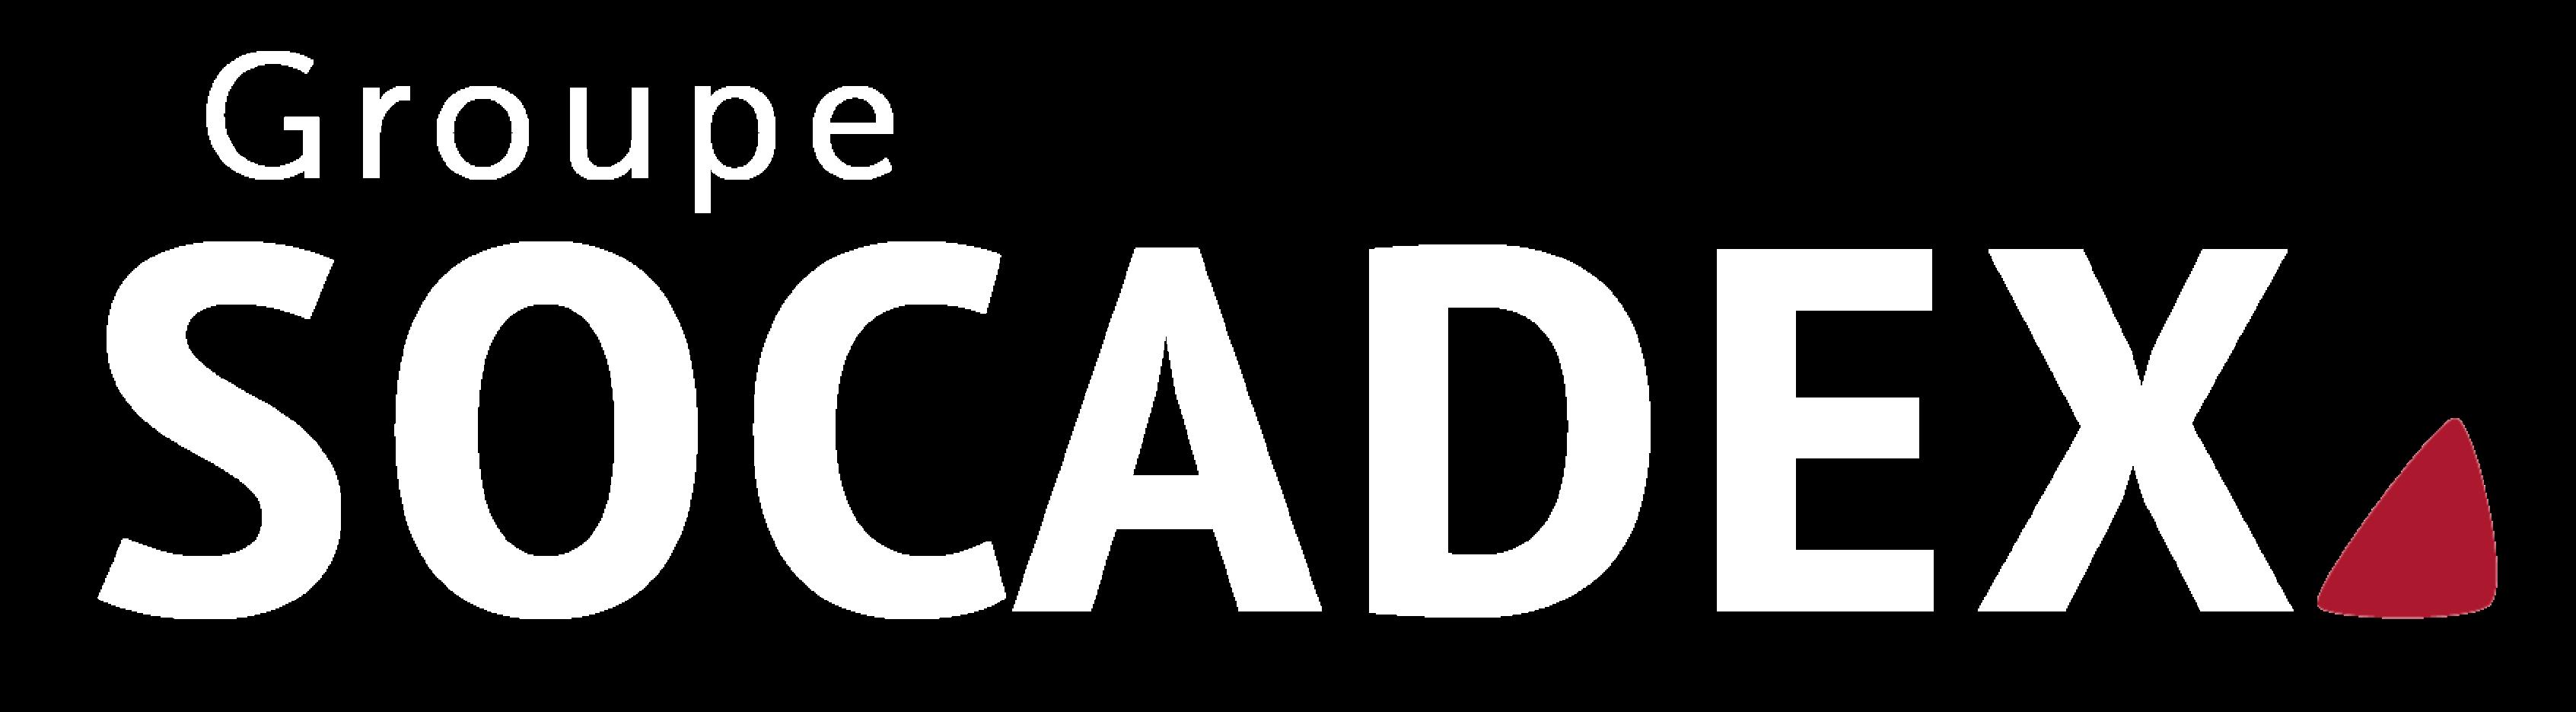 Groupe SOCADEX